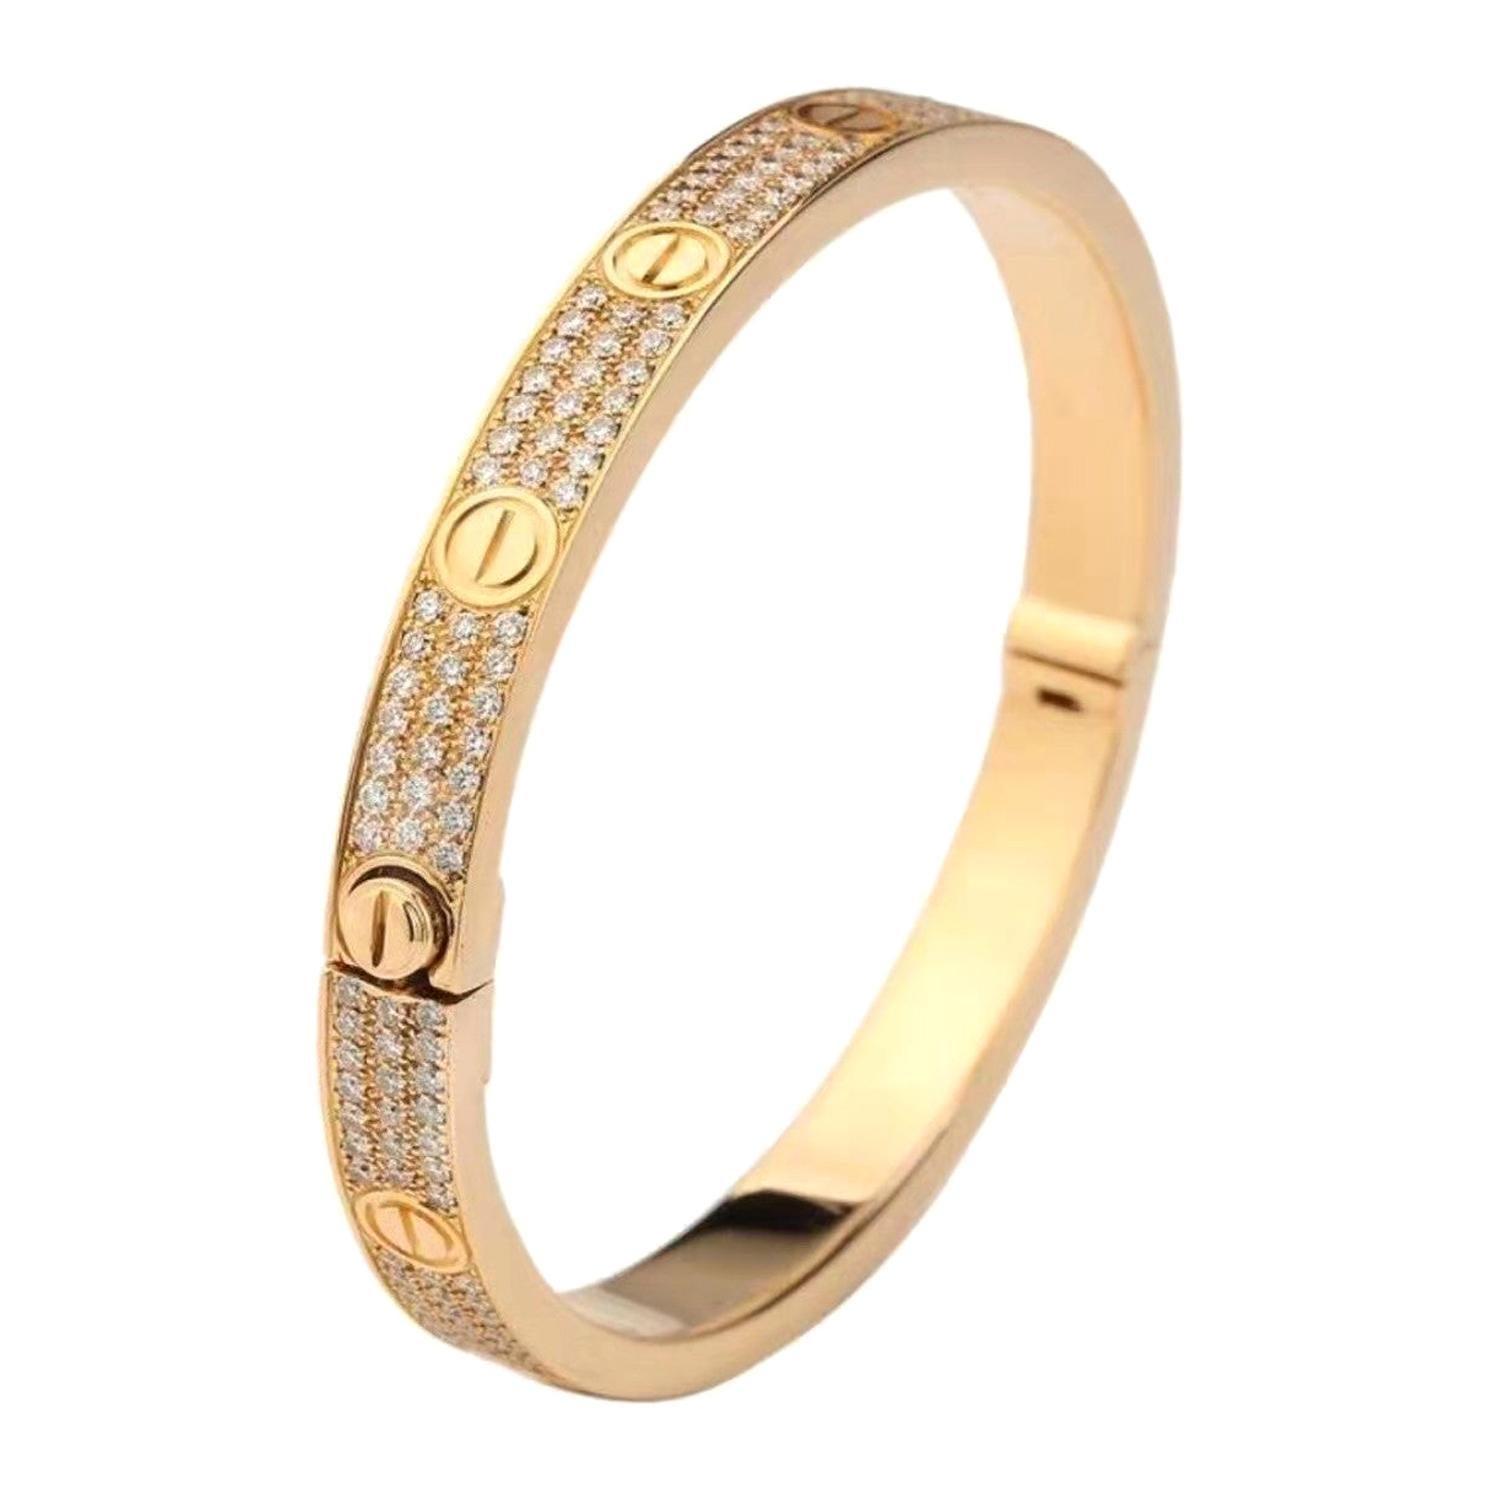 18 Karat Yellow Gold Cartier Love Bracelet with Pave Diamonds